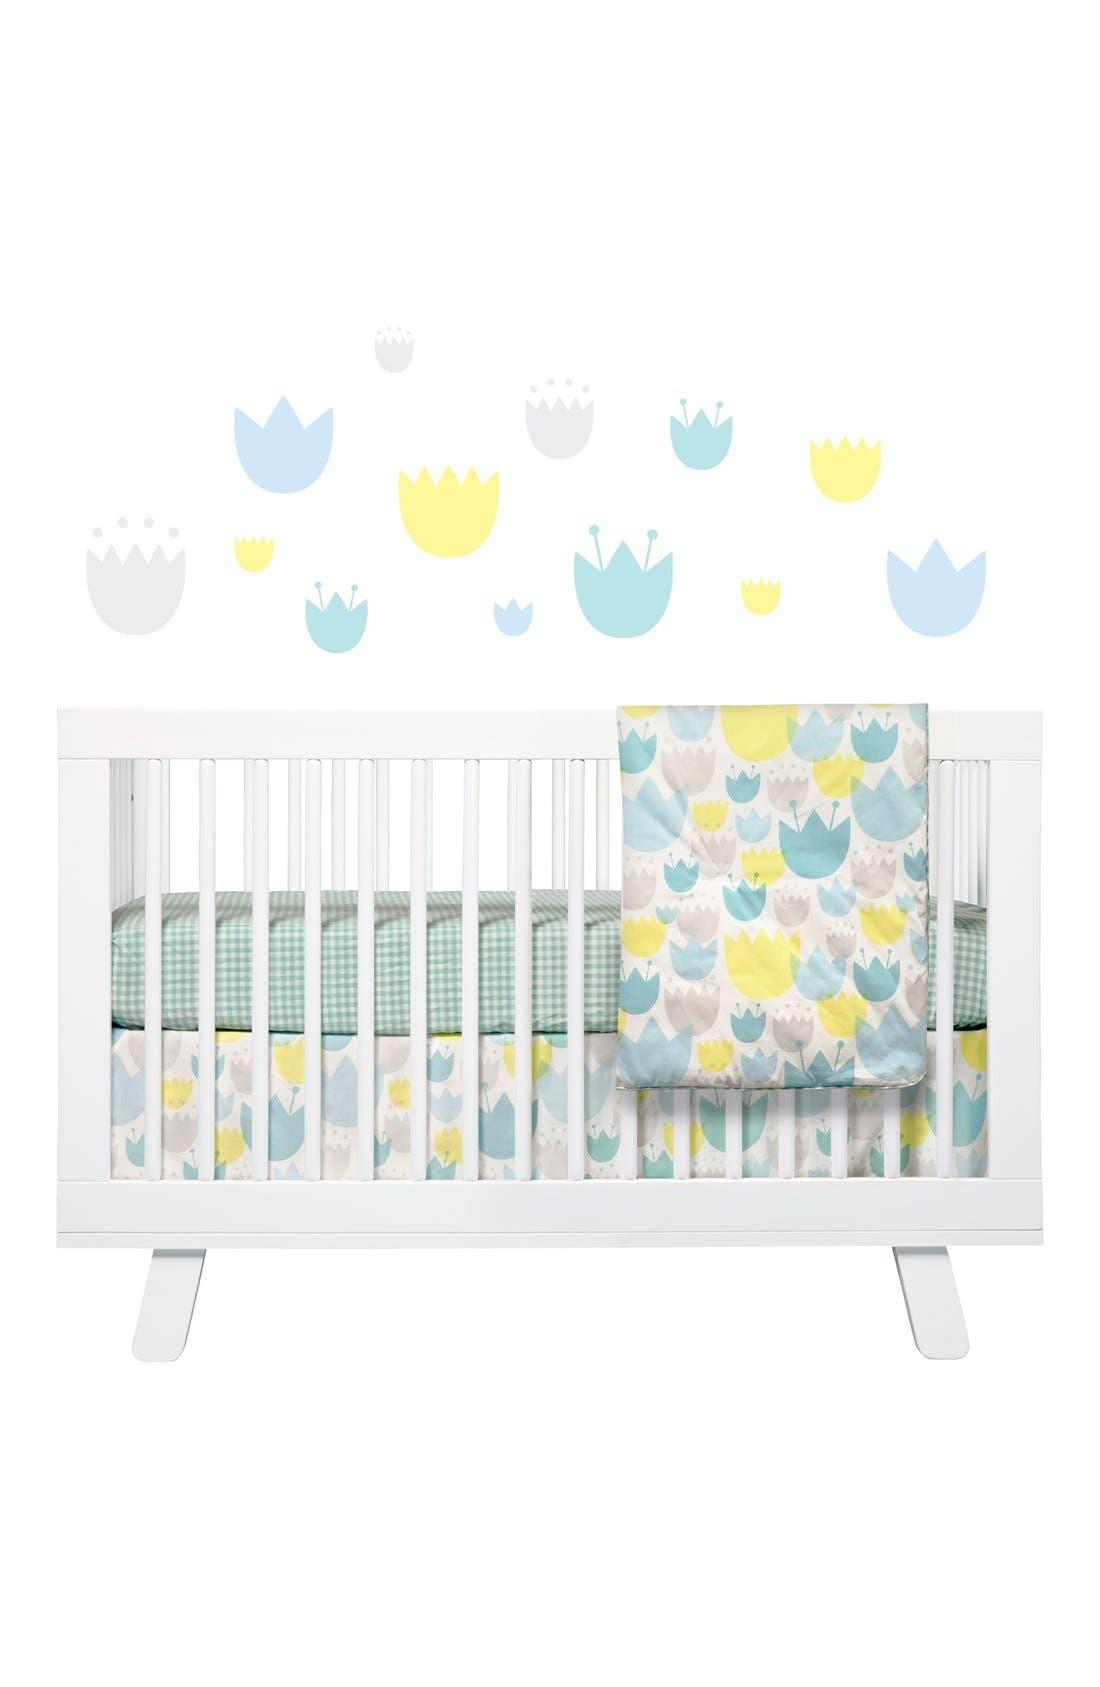 Alternate Image 1 Selected - babyletto 'Garden' Crib Sheet, Crib Skirt, Stroller Blanket & Wall Decals